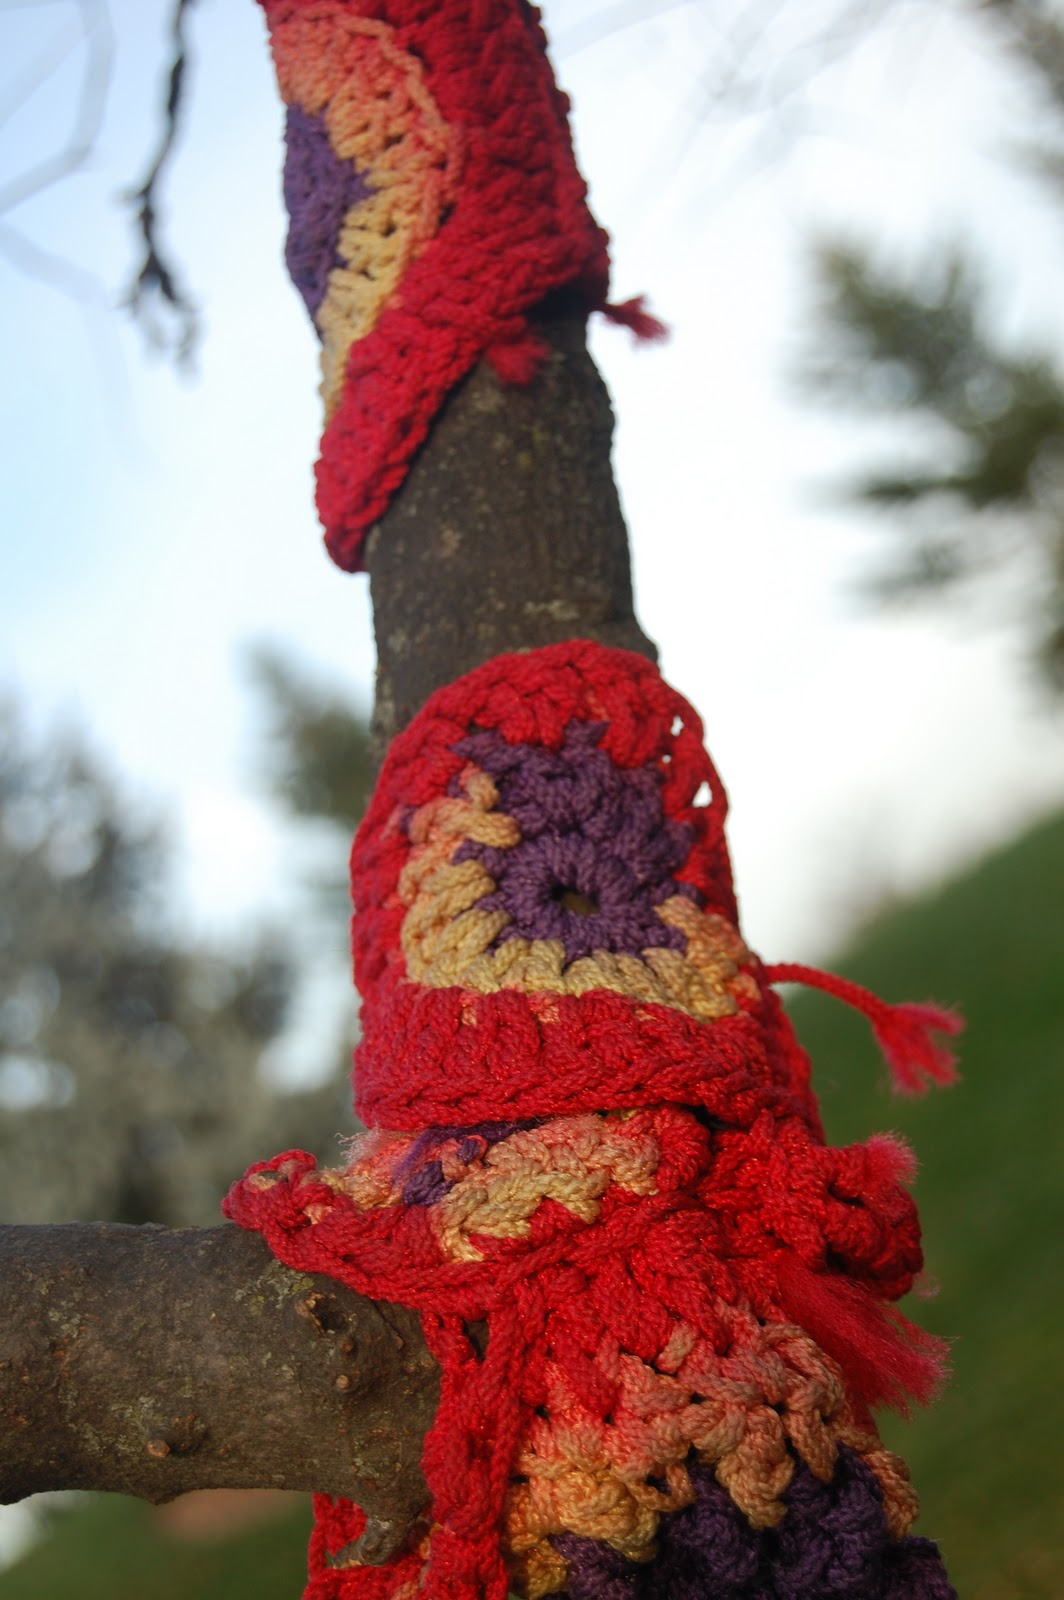 Gardener in a Forest: Yarn Bomb Detonated in Lisle, IL